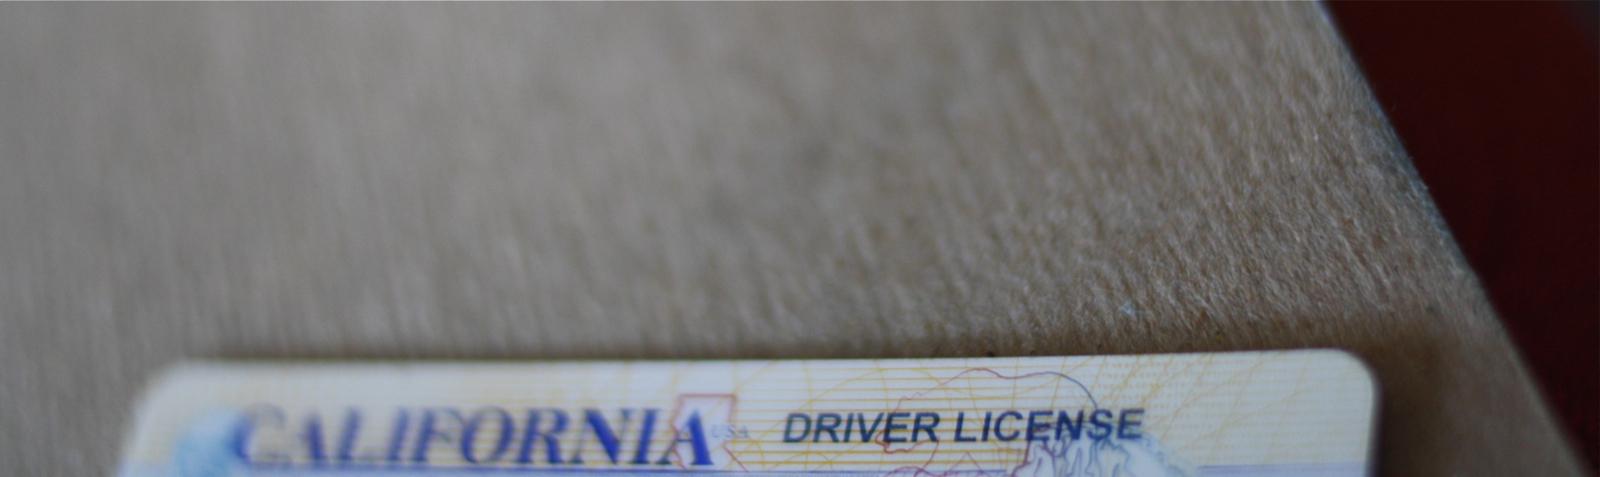 a CA drivers license